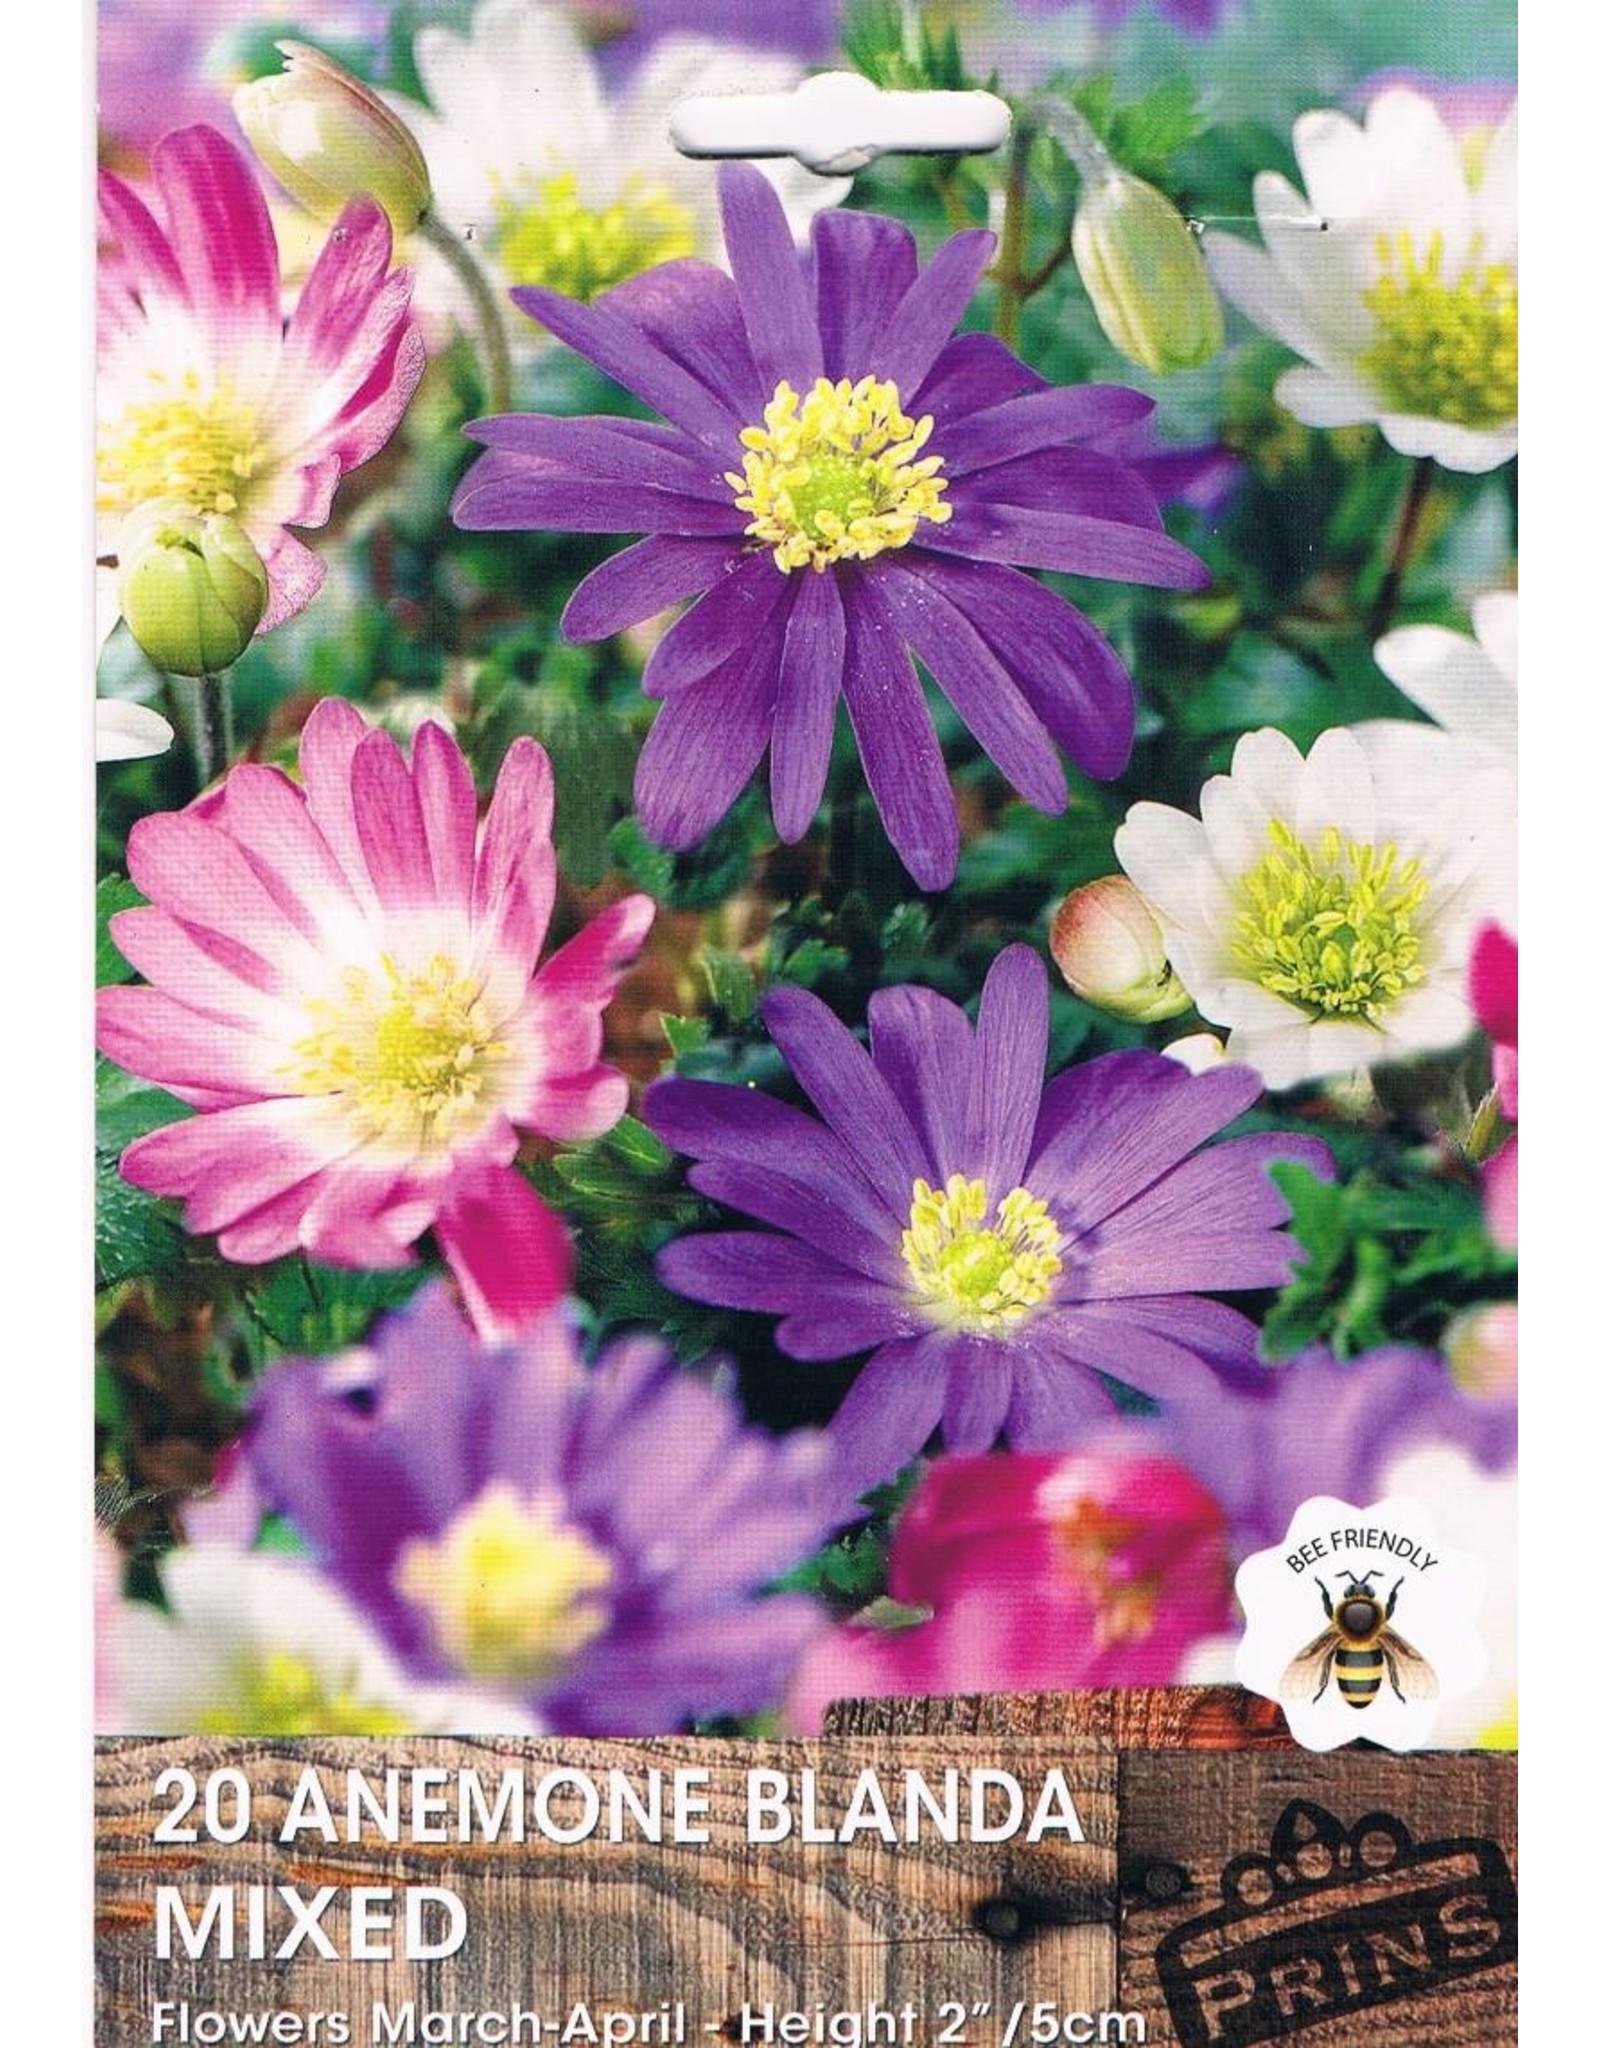 Hollands geteeld Anemone blanda mix